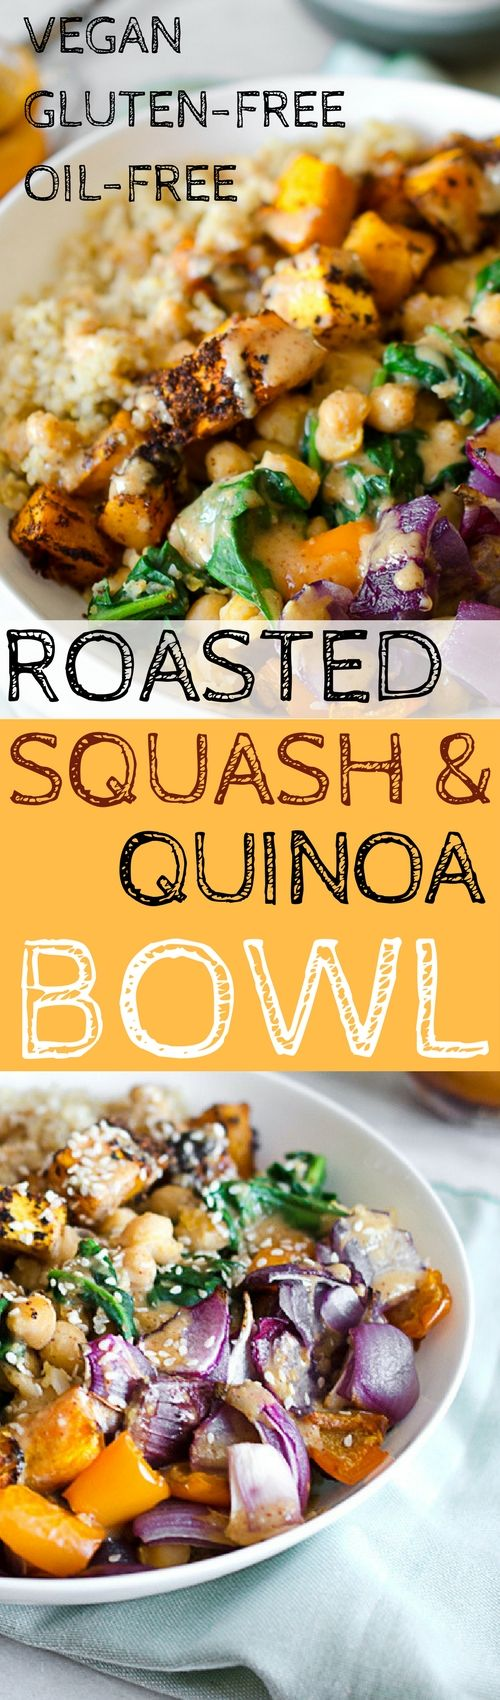 VEGAN BUDDHA BOWL! Chilli roasted squash, quinoa & almond citrus sauce. Plant based recipes, vegan gluten free recipes.